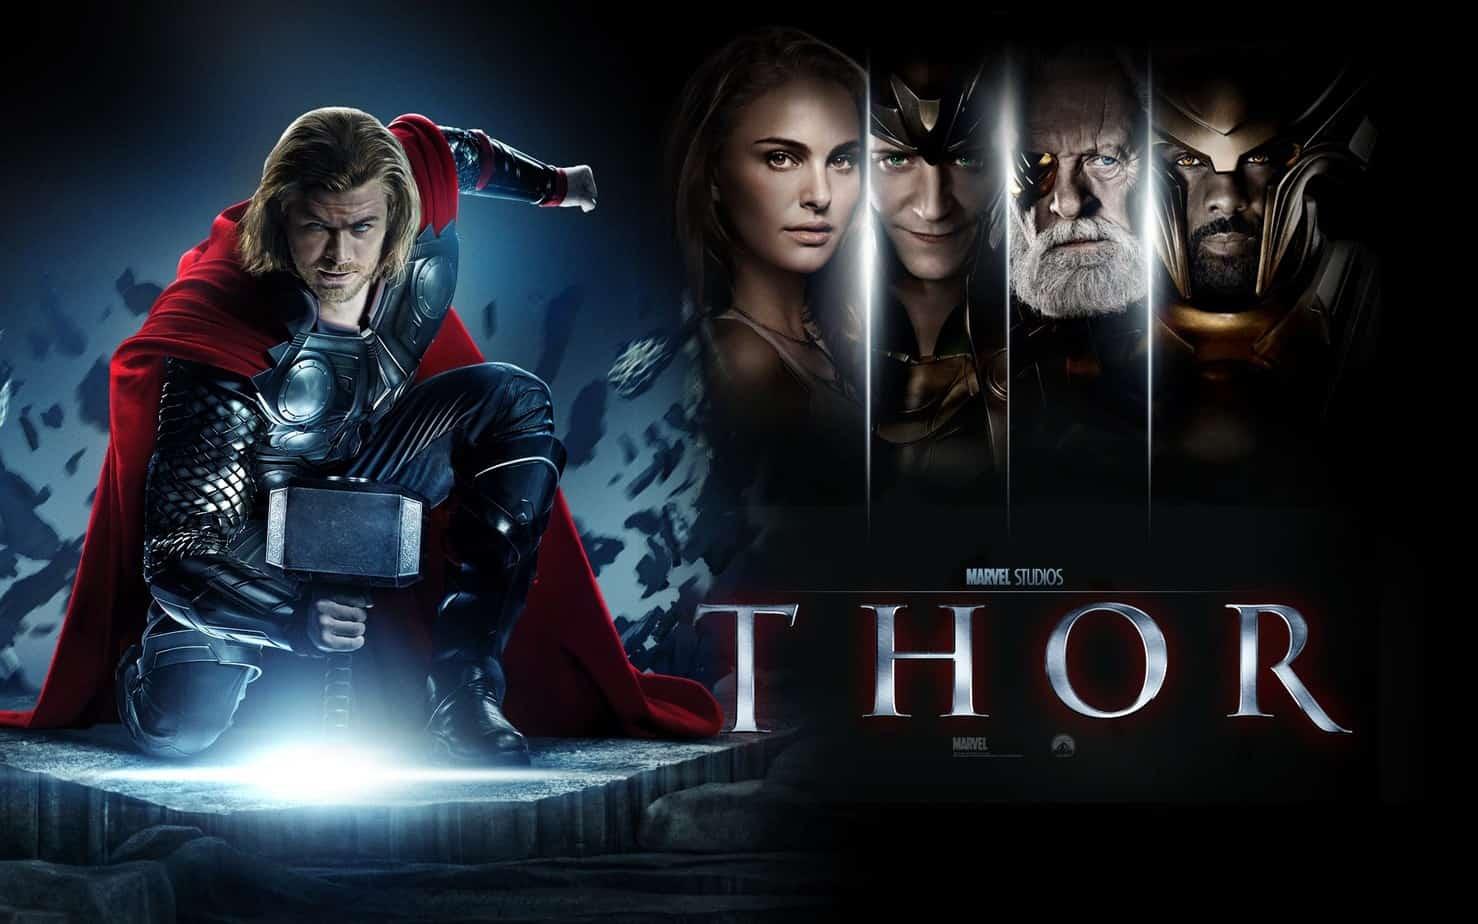 Trailer: Thor (2011)